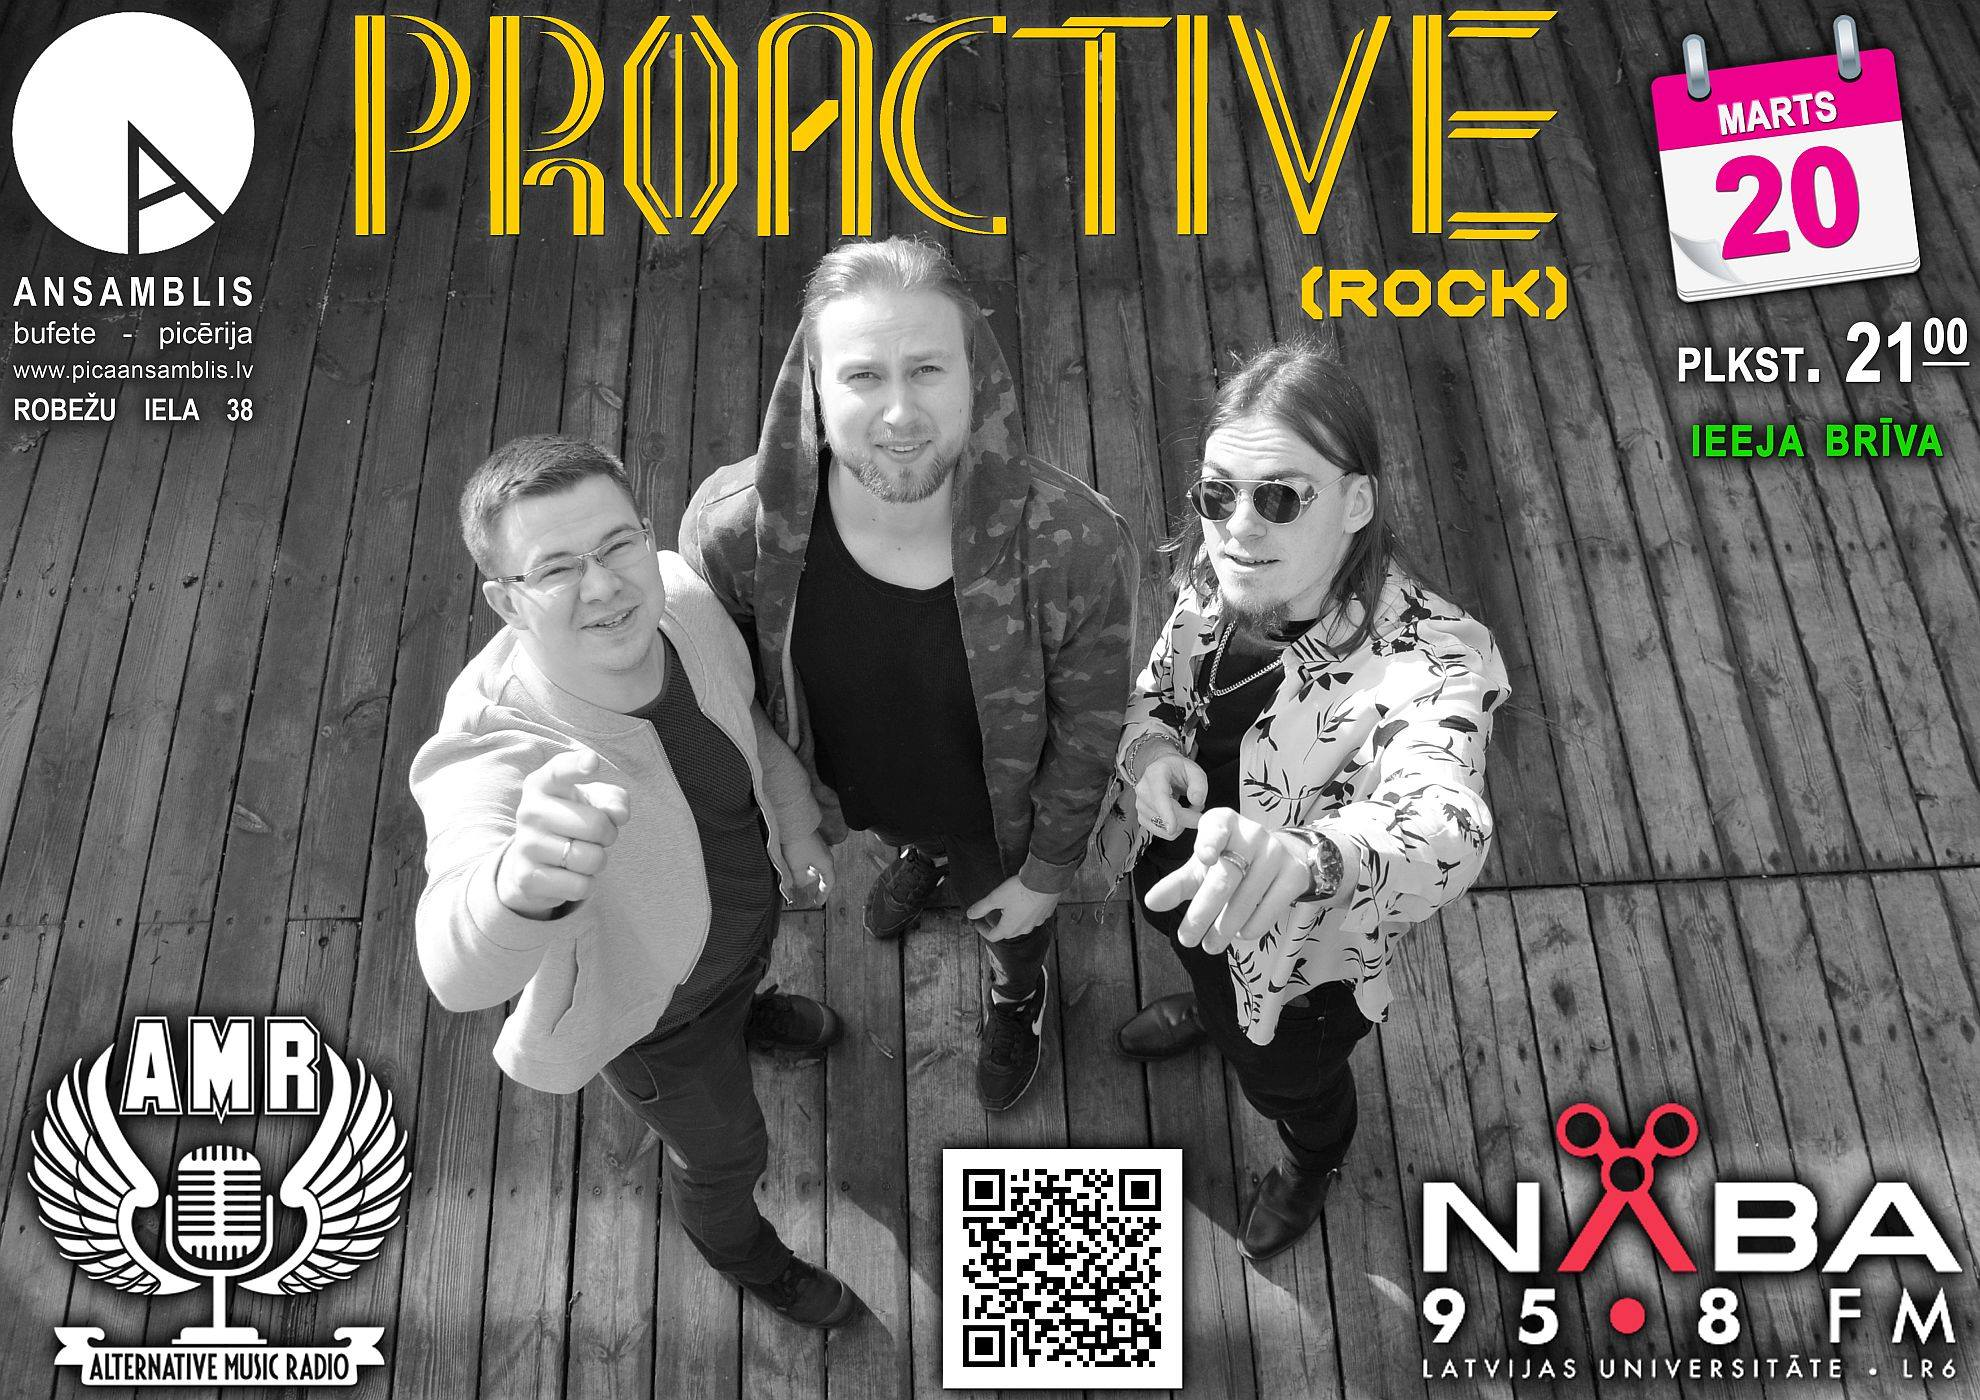 PROACTIVE (rock)